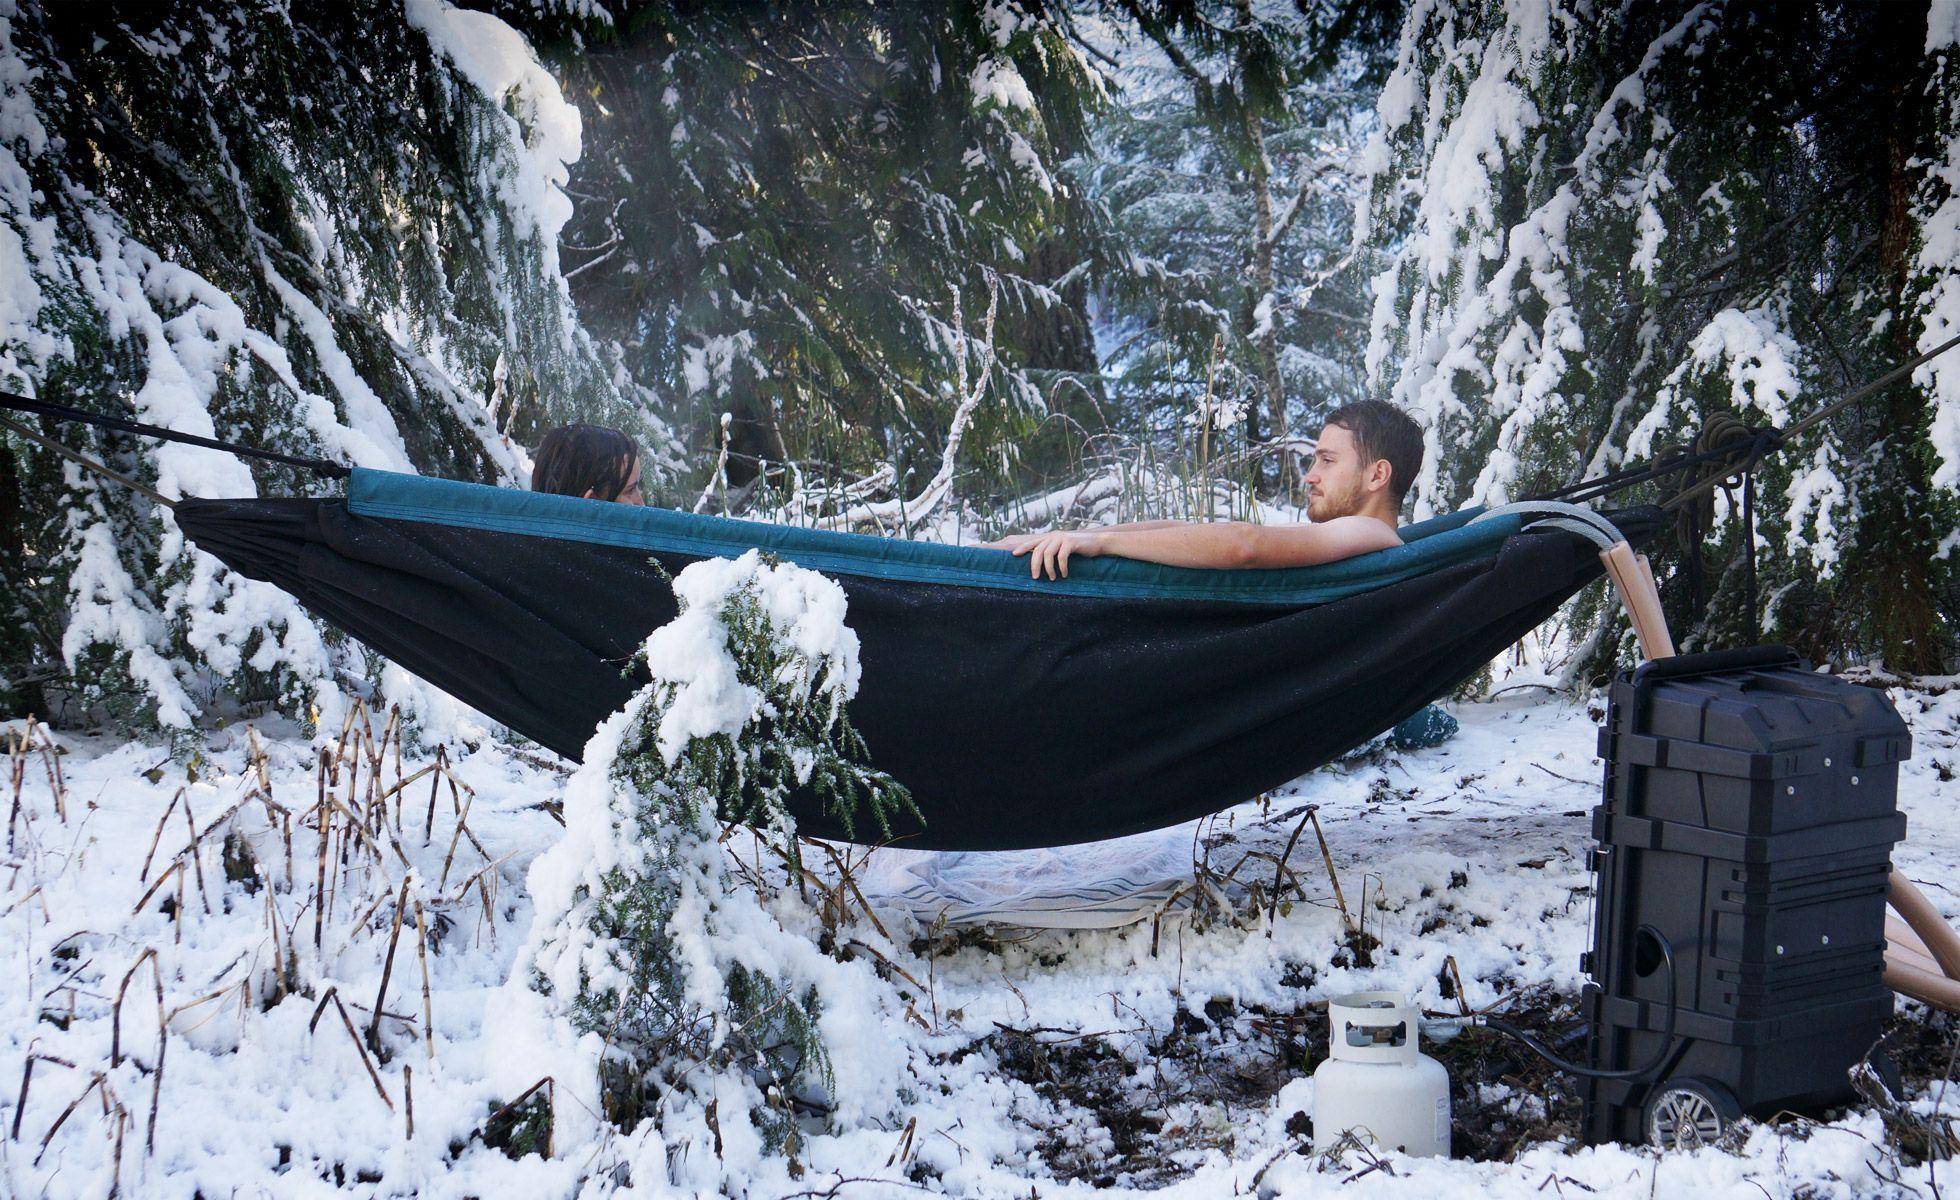 Hydro hammock hot tubs and gift